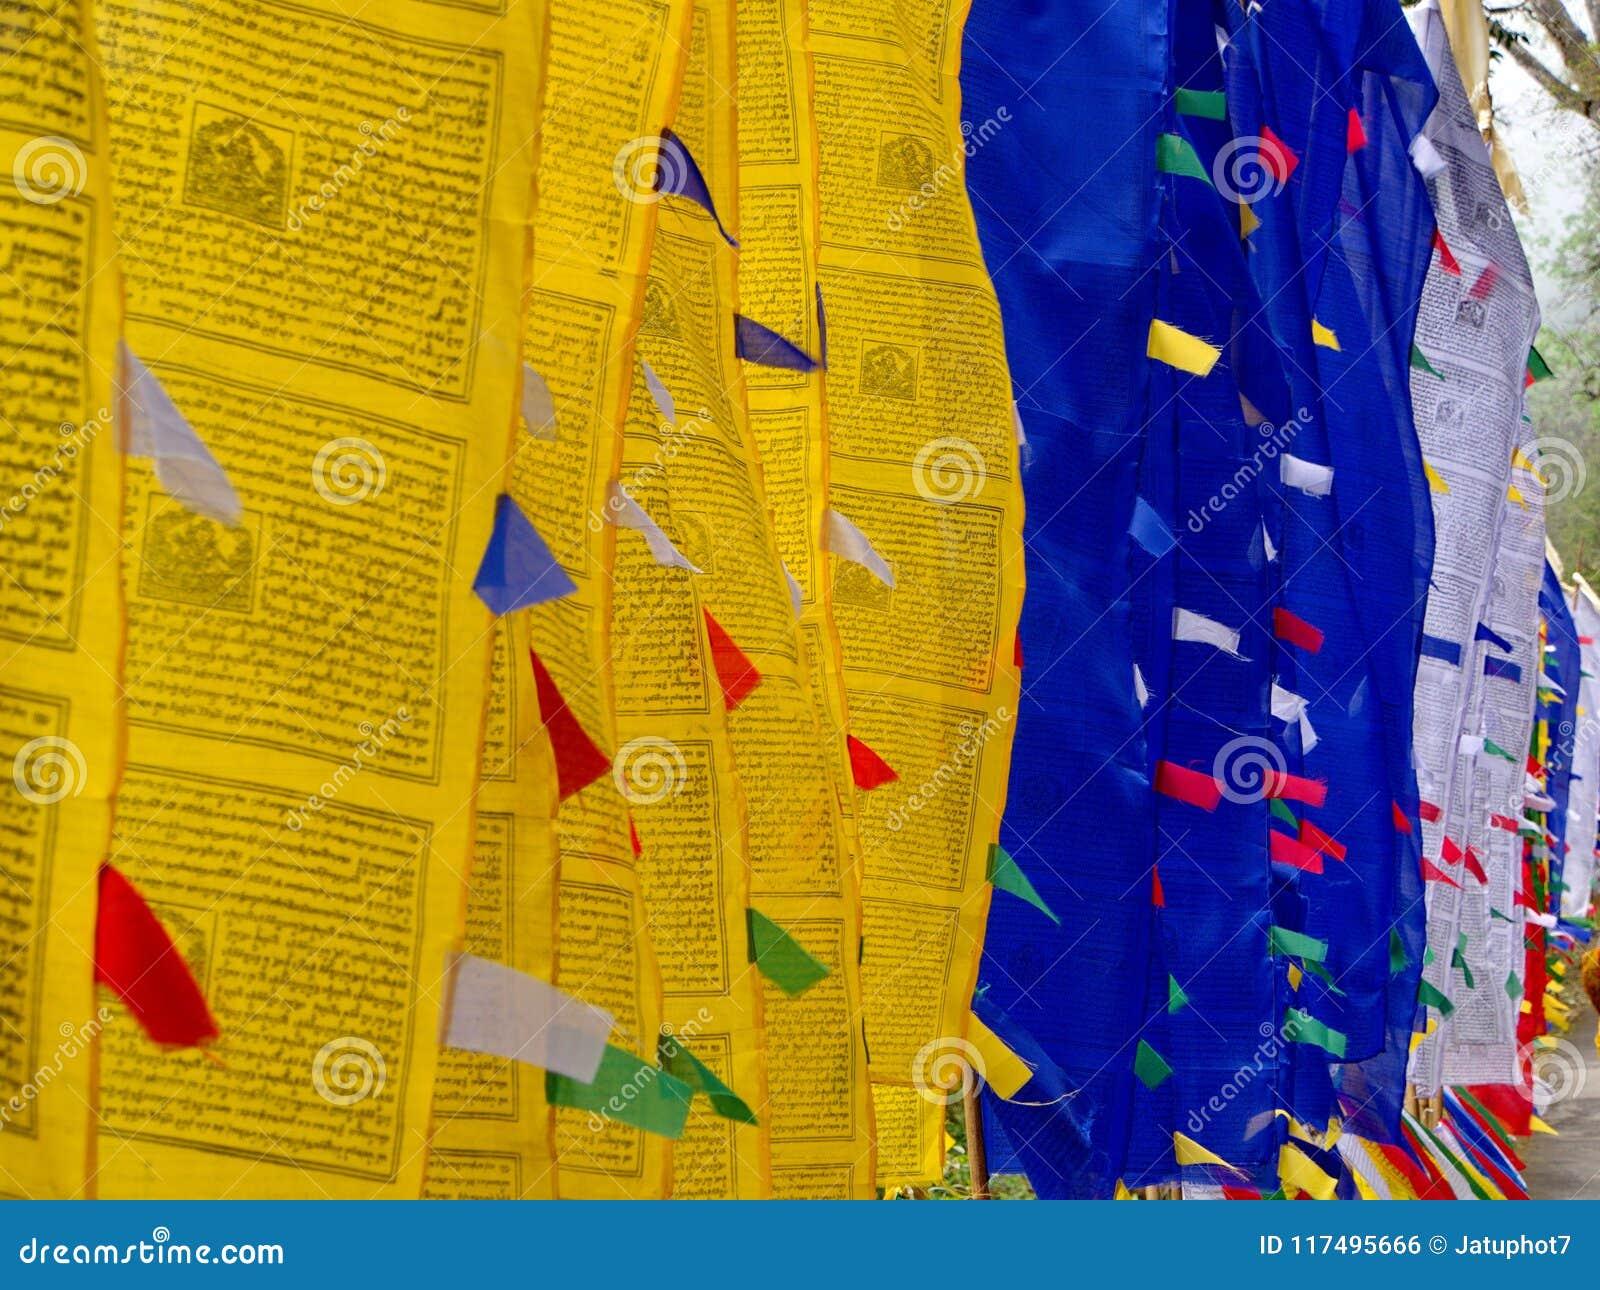 Tibetan Prayer Flag for Faith, peace, wisdom, compassion, and st